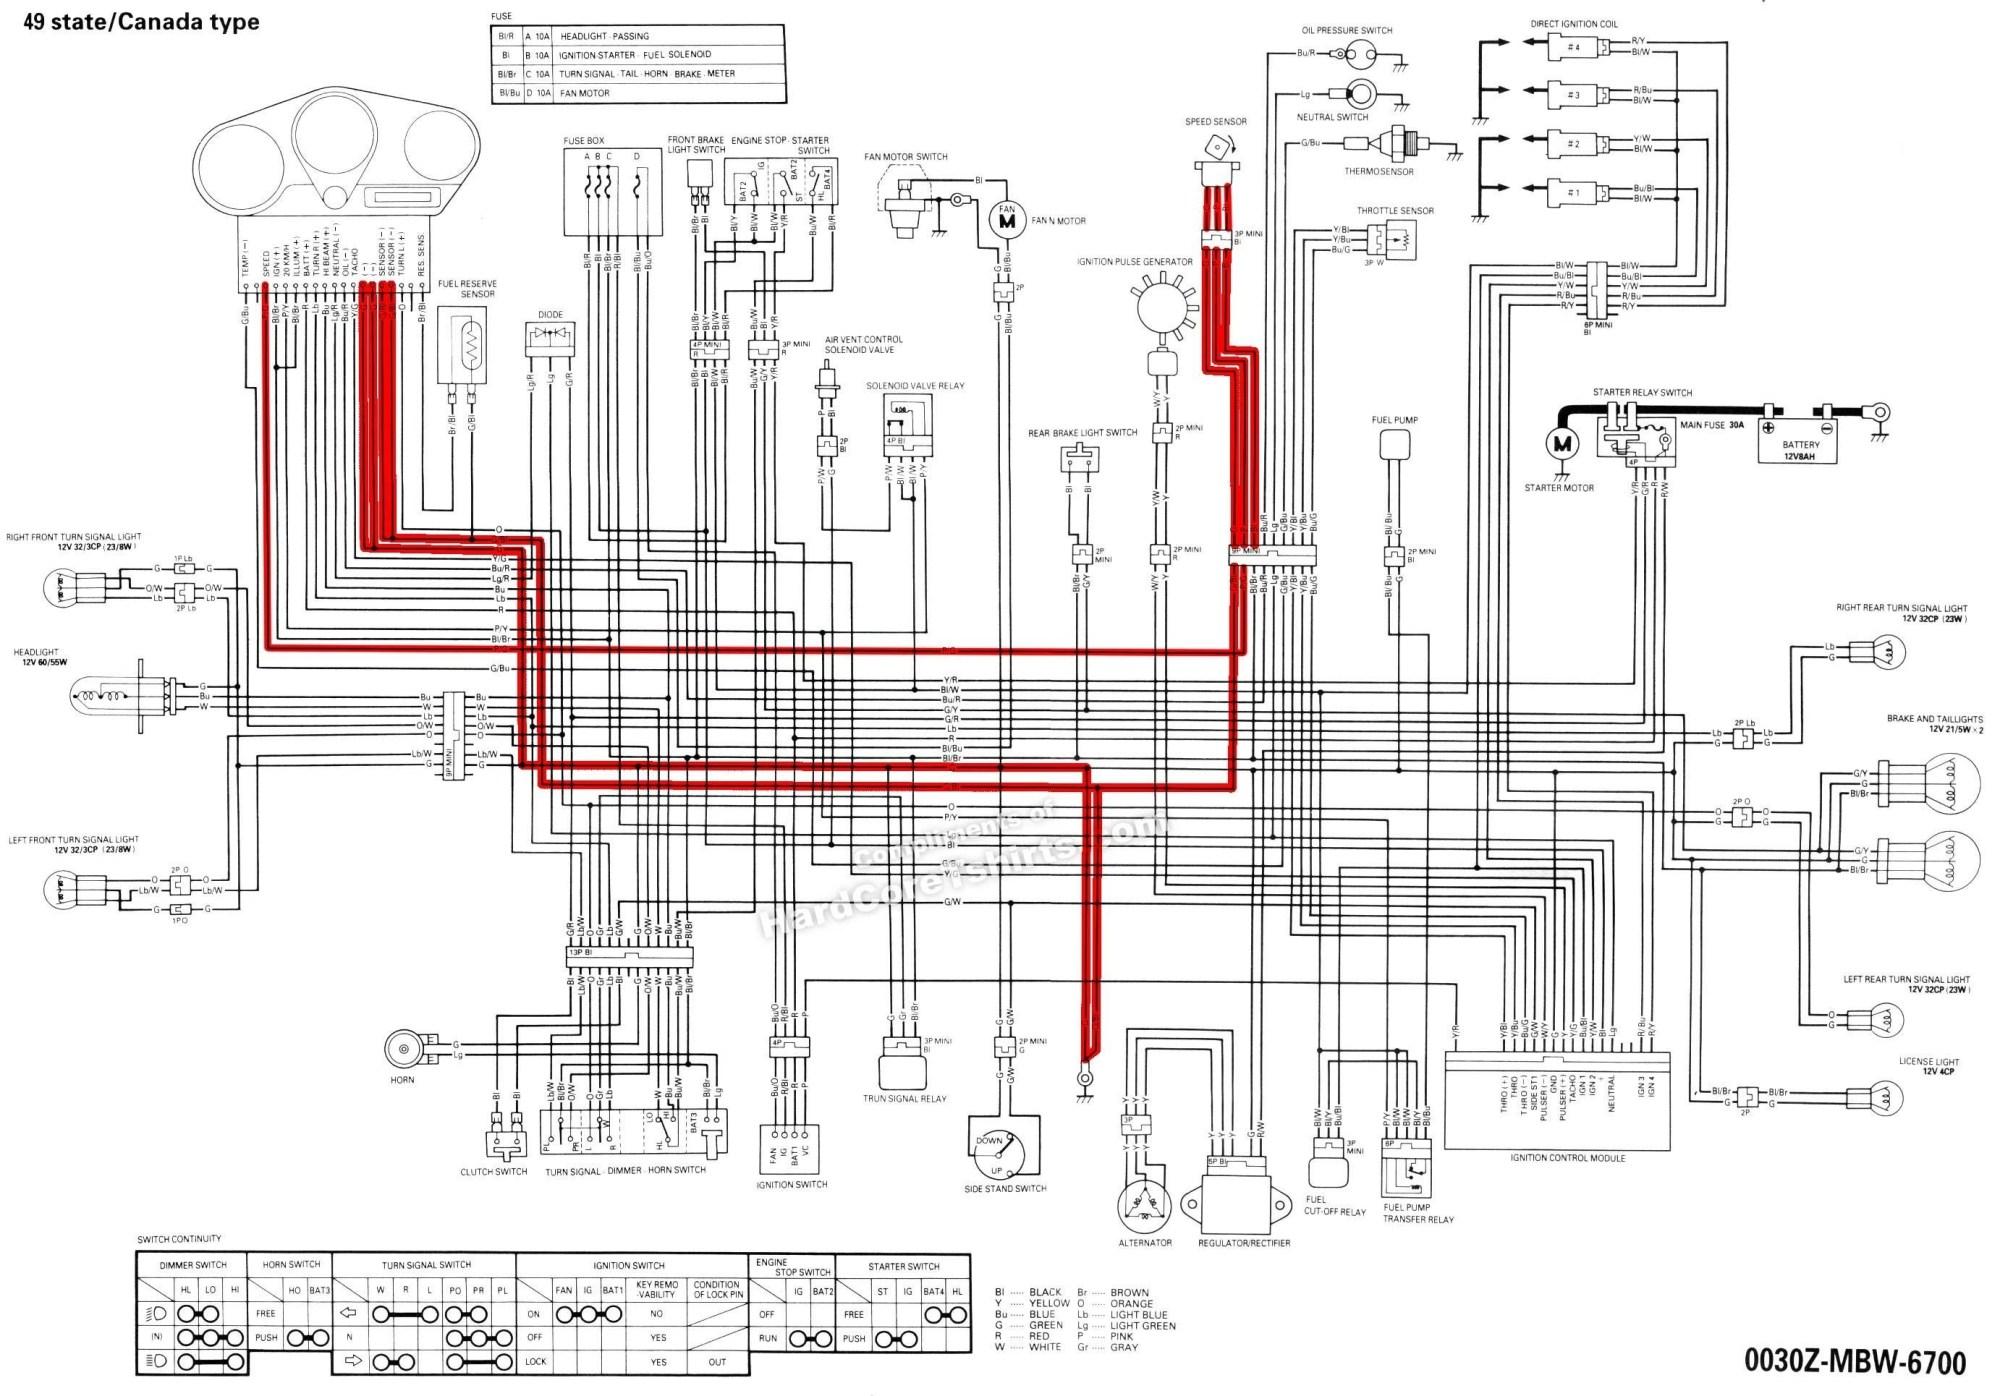 FF_0030] 1991 1994 Honda Cbr600 Fuse Box Diagram Wiring DiagramHapolo Hyedi Unpr Tomy Shopa Mohammedshrine Librar Wiring 101